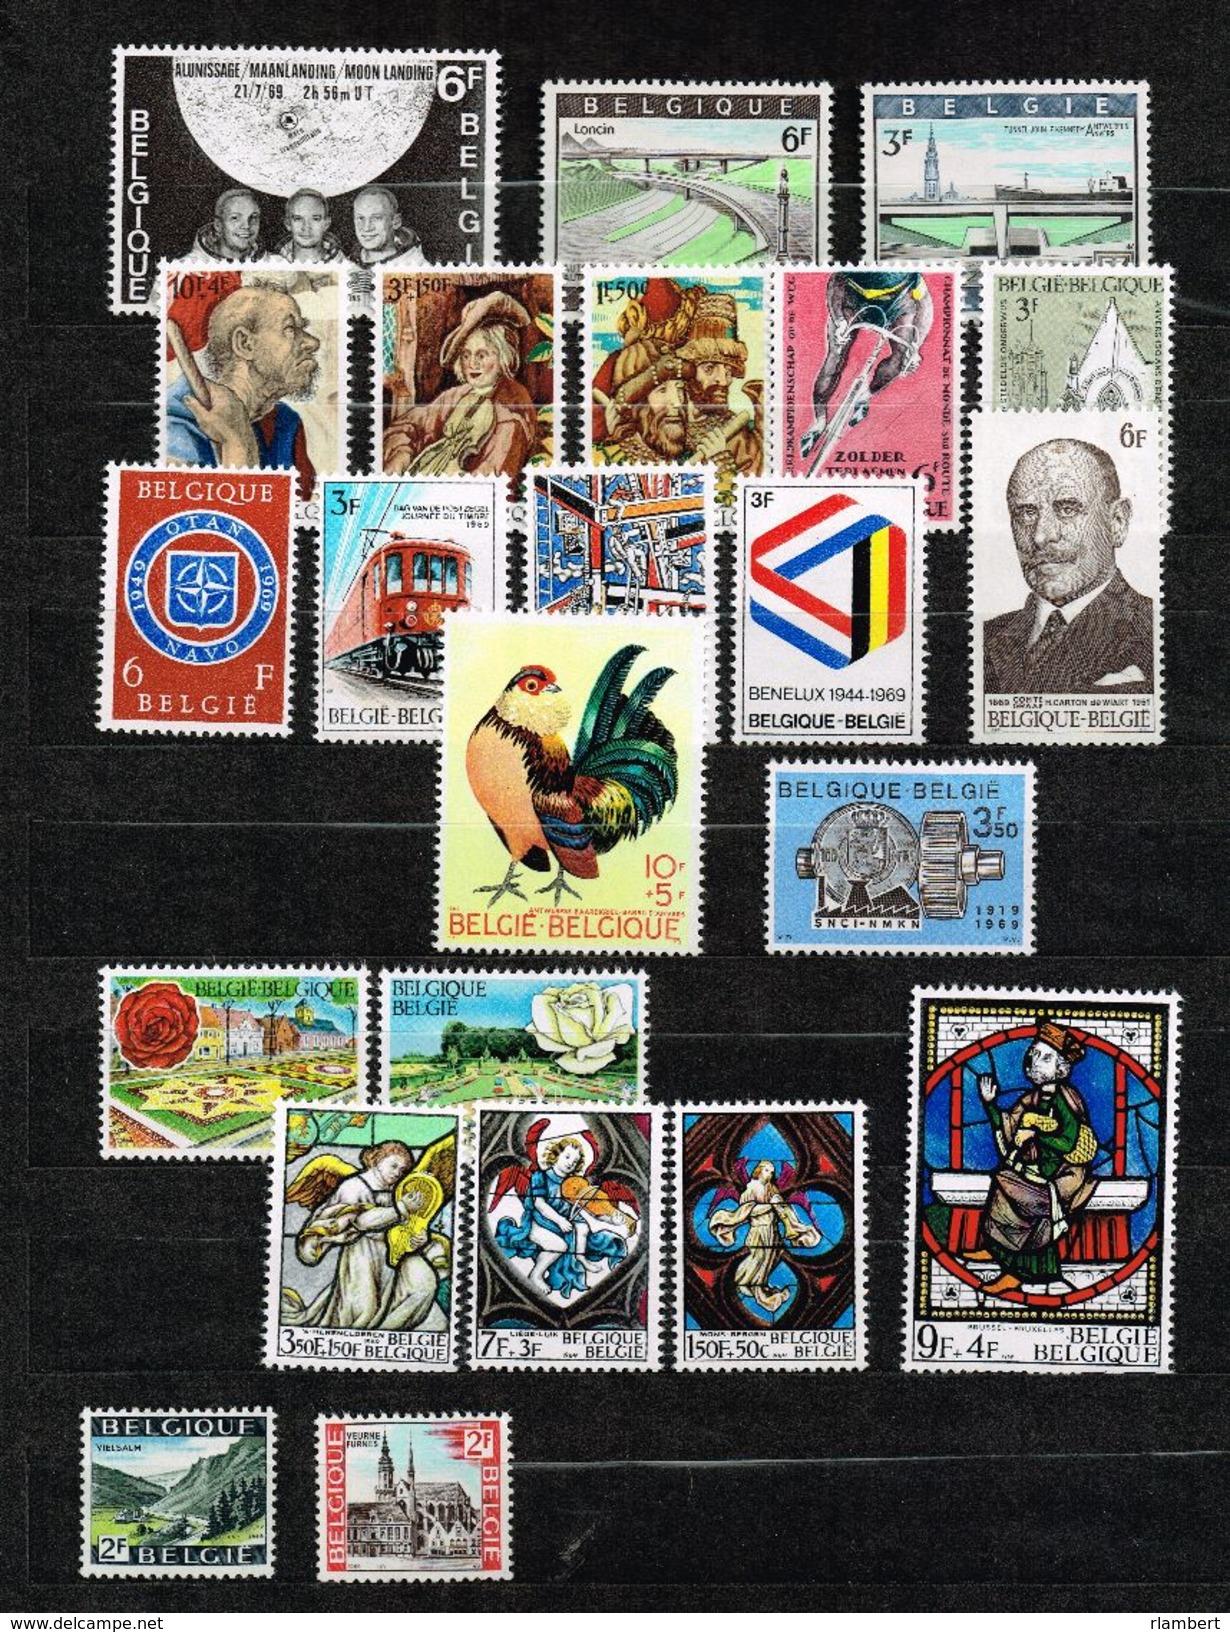 Lot Belg 1969 Postfris - België